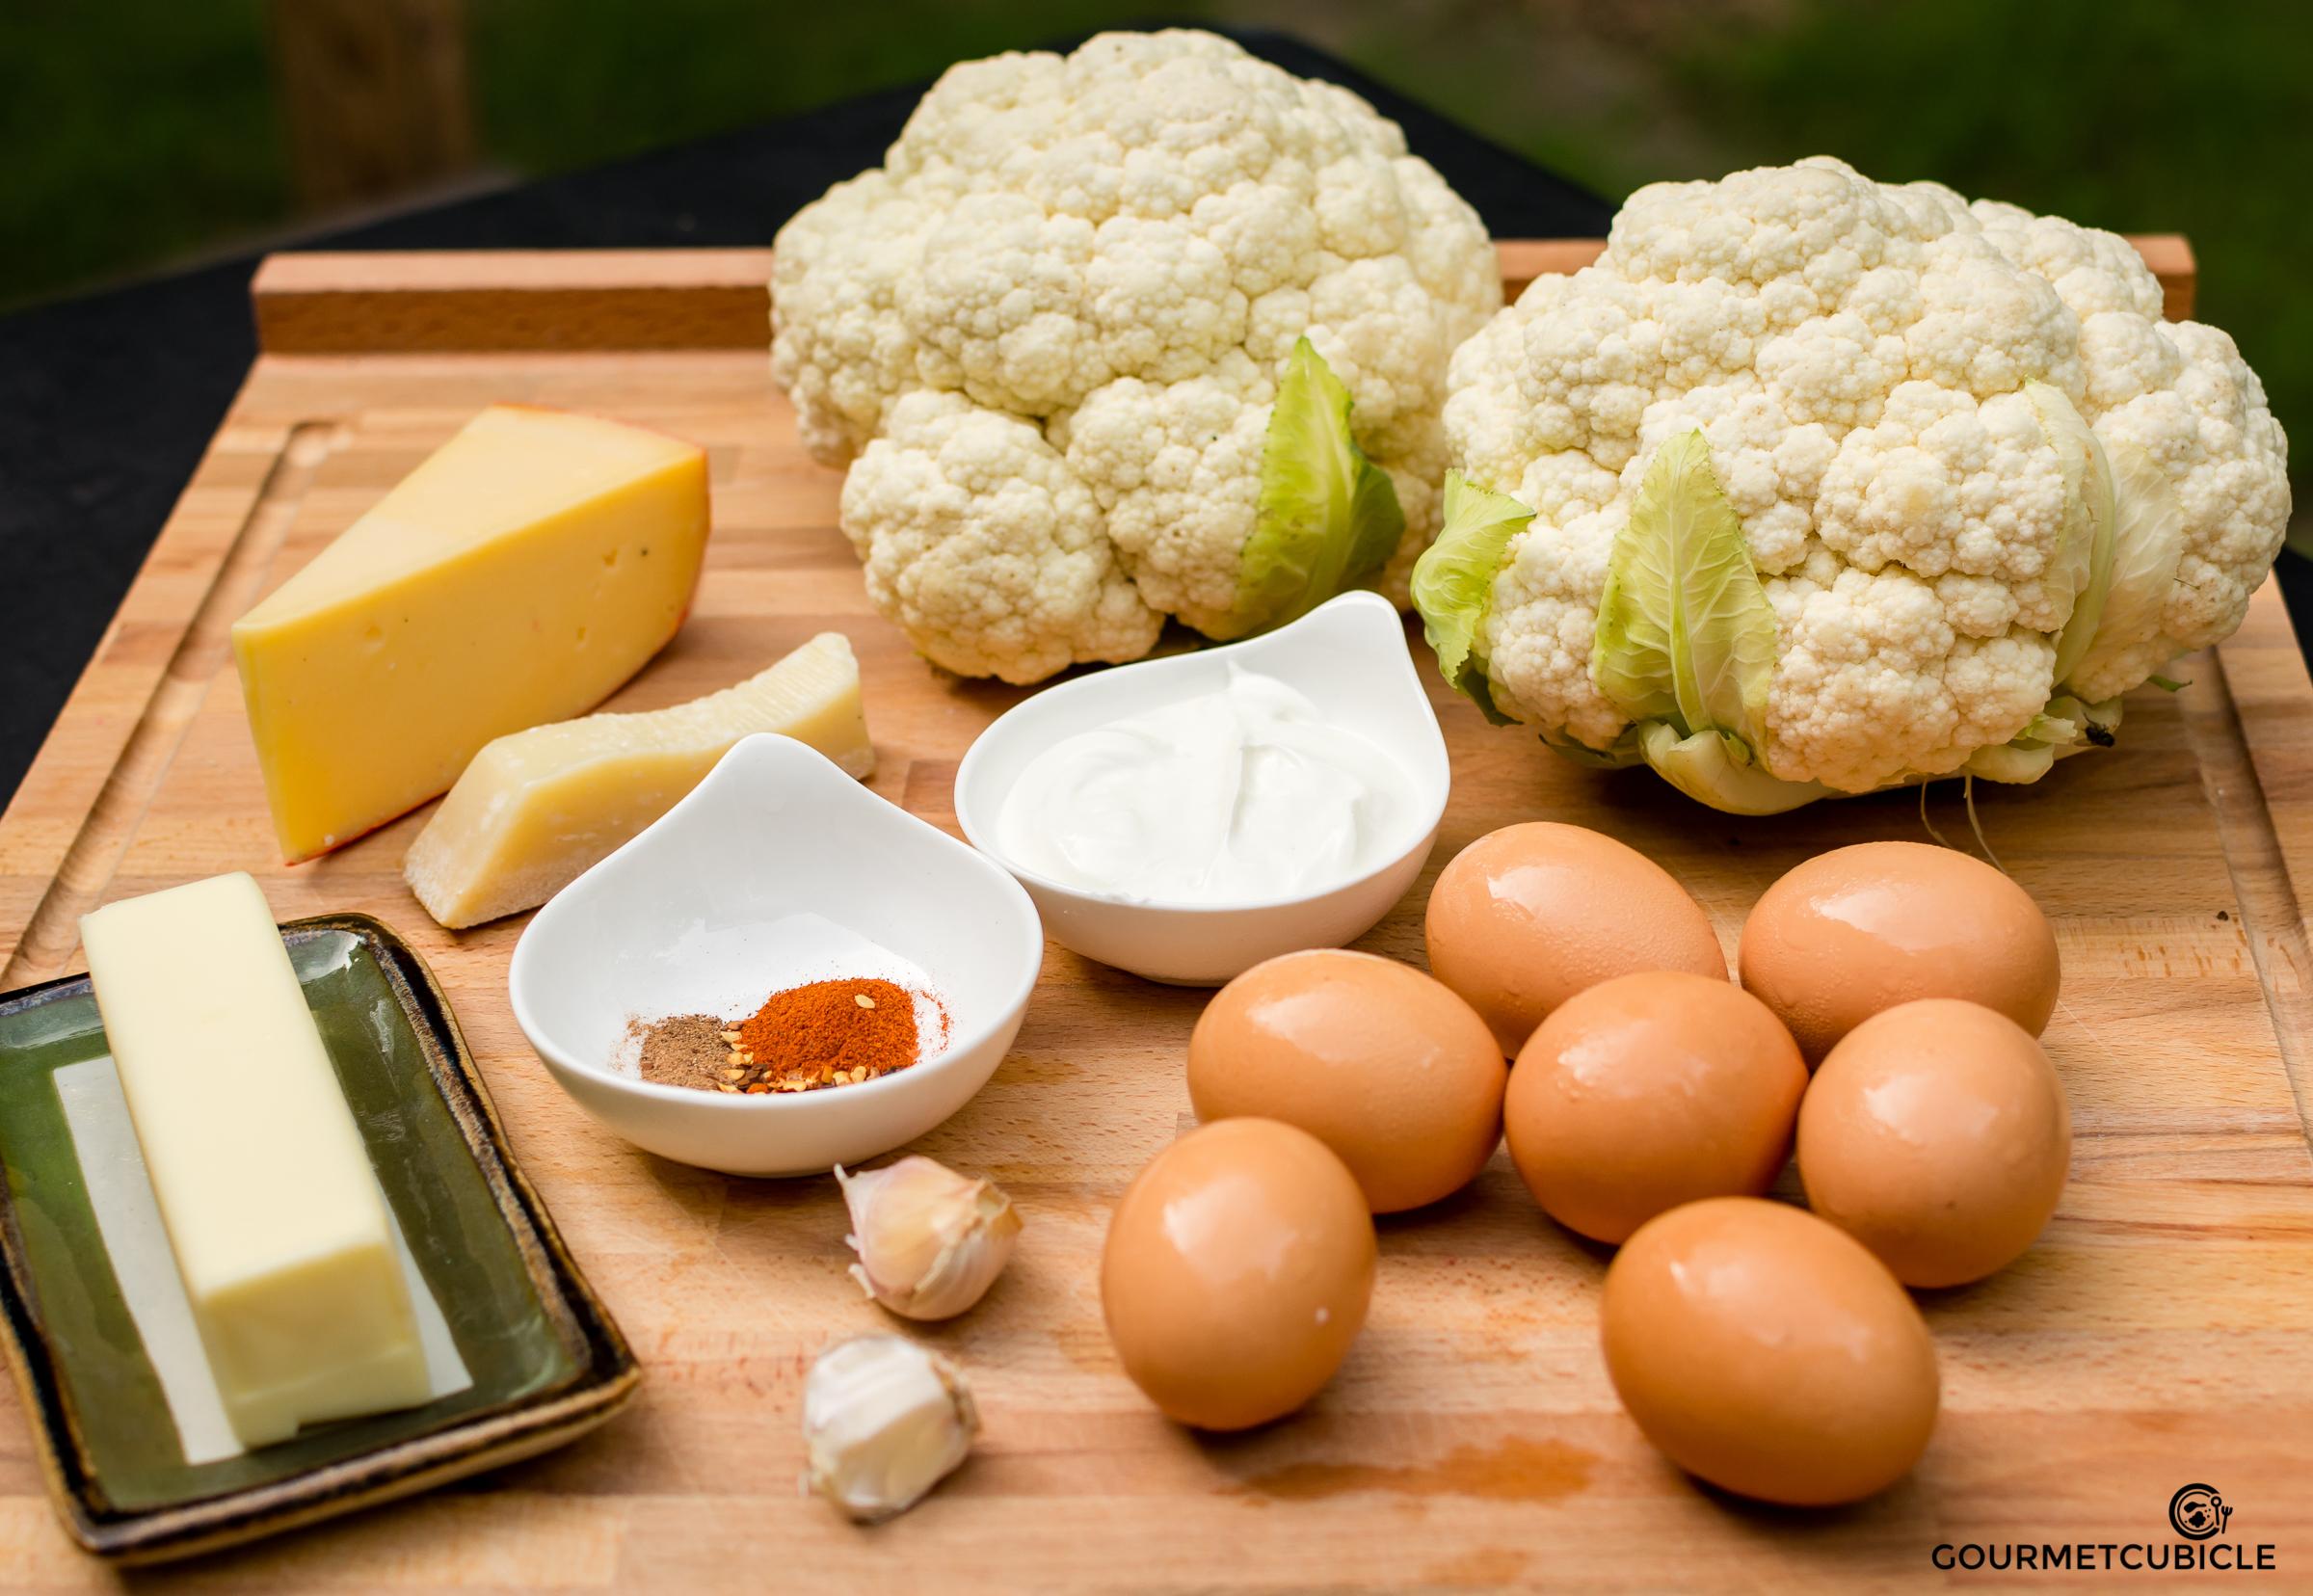 20150708-cauliflower_souffle1.jpg